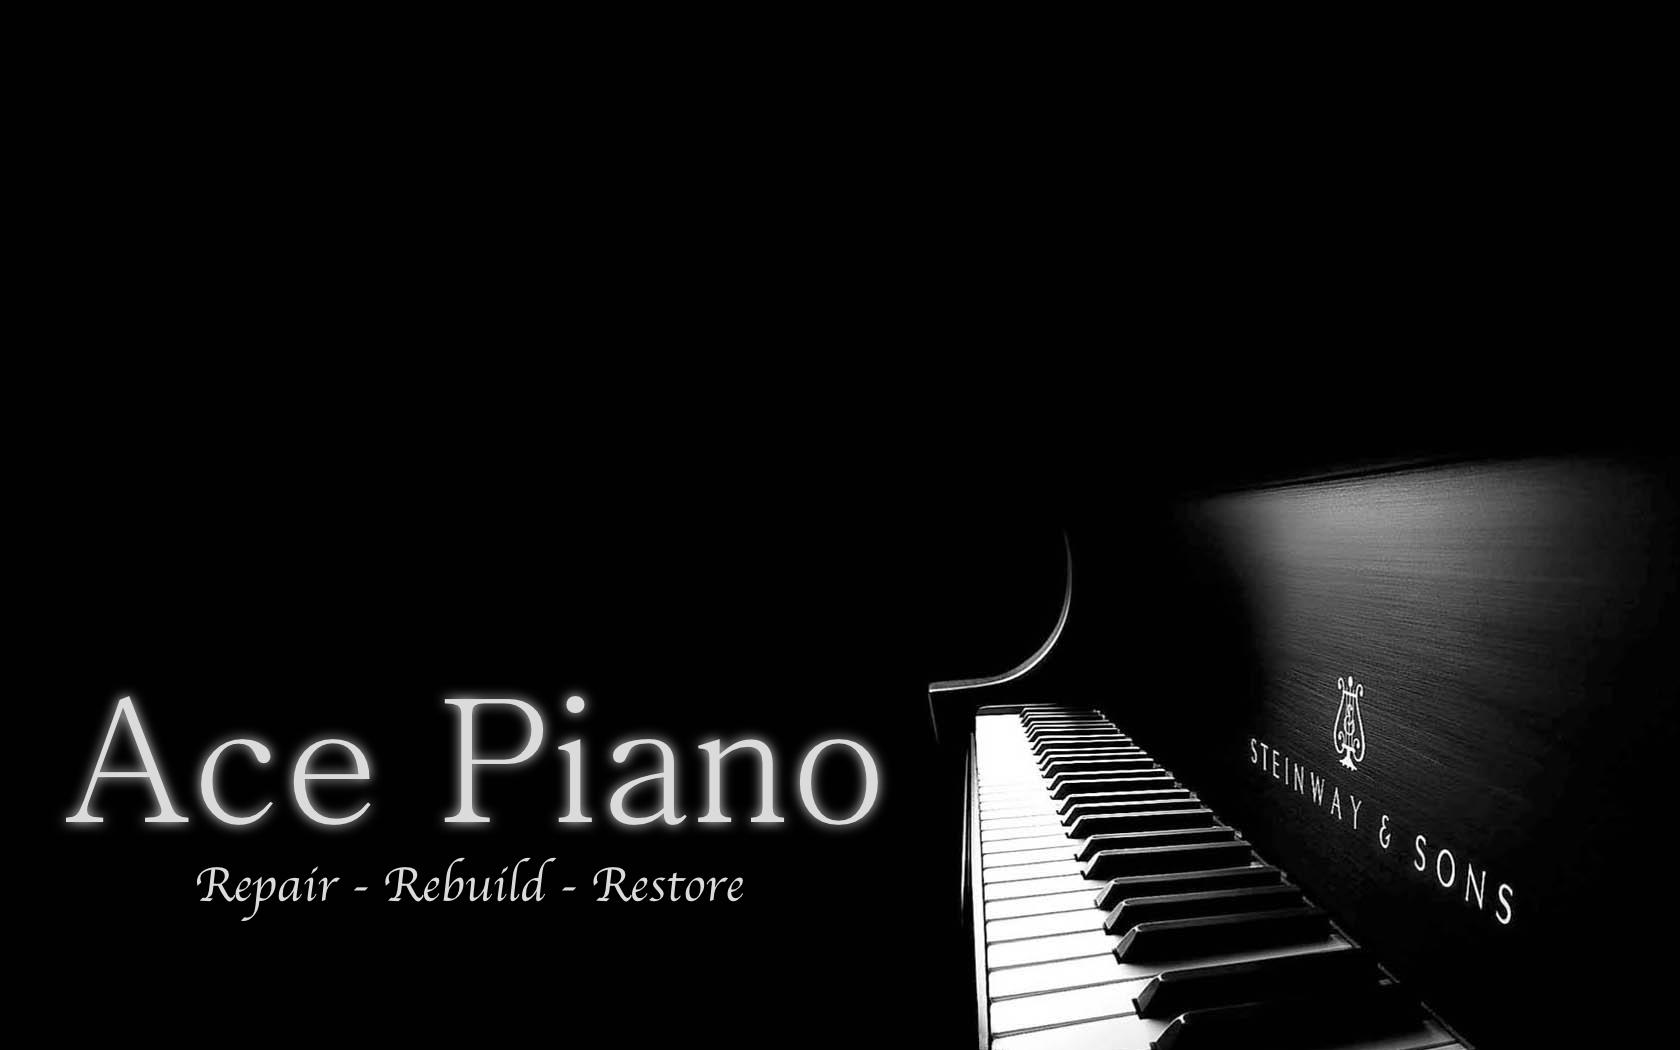 Ace Piano Banner Ace Piano Inc Piano Tuning Repair Rebuild